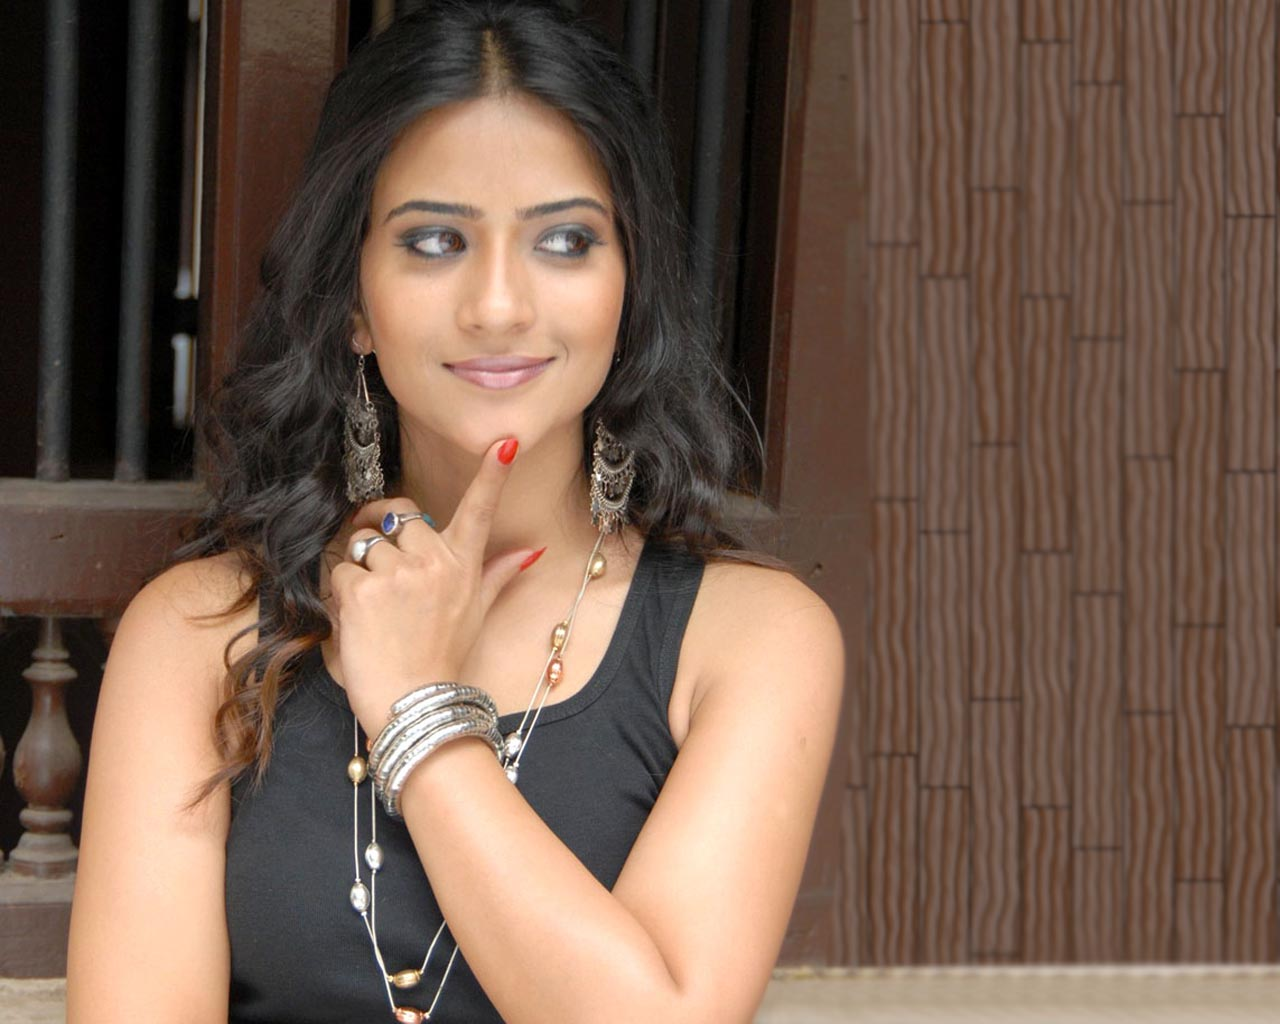 Cute N Sweet Hd Wallpapers Lovely Aditi Sharma Actress Wallpapers